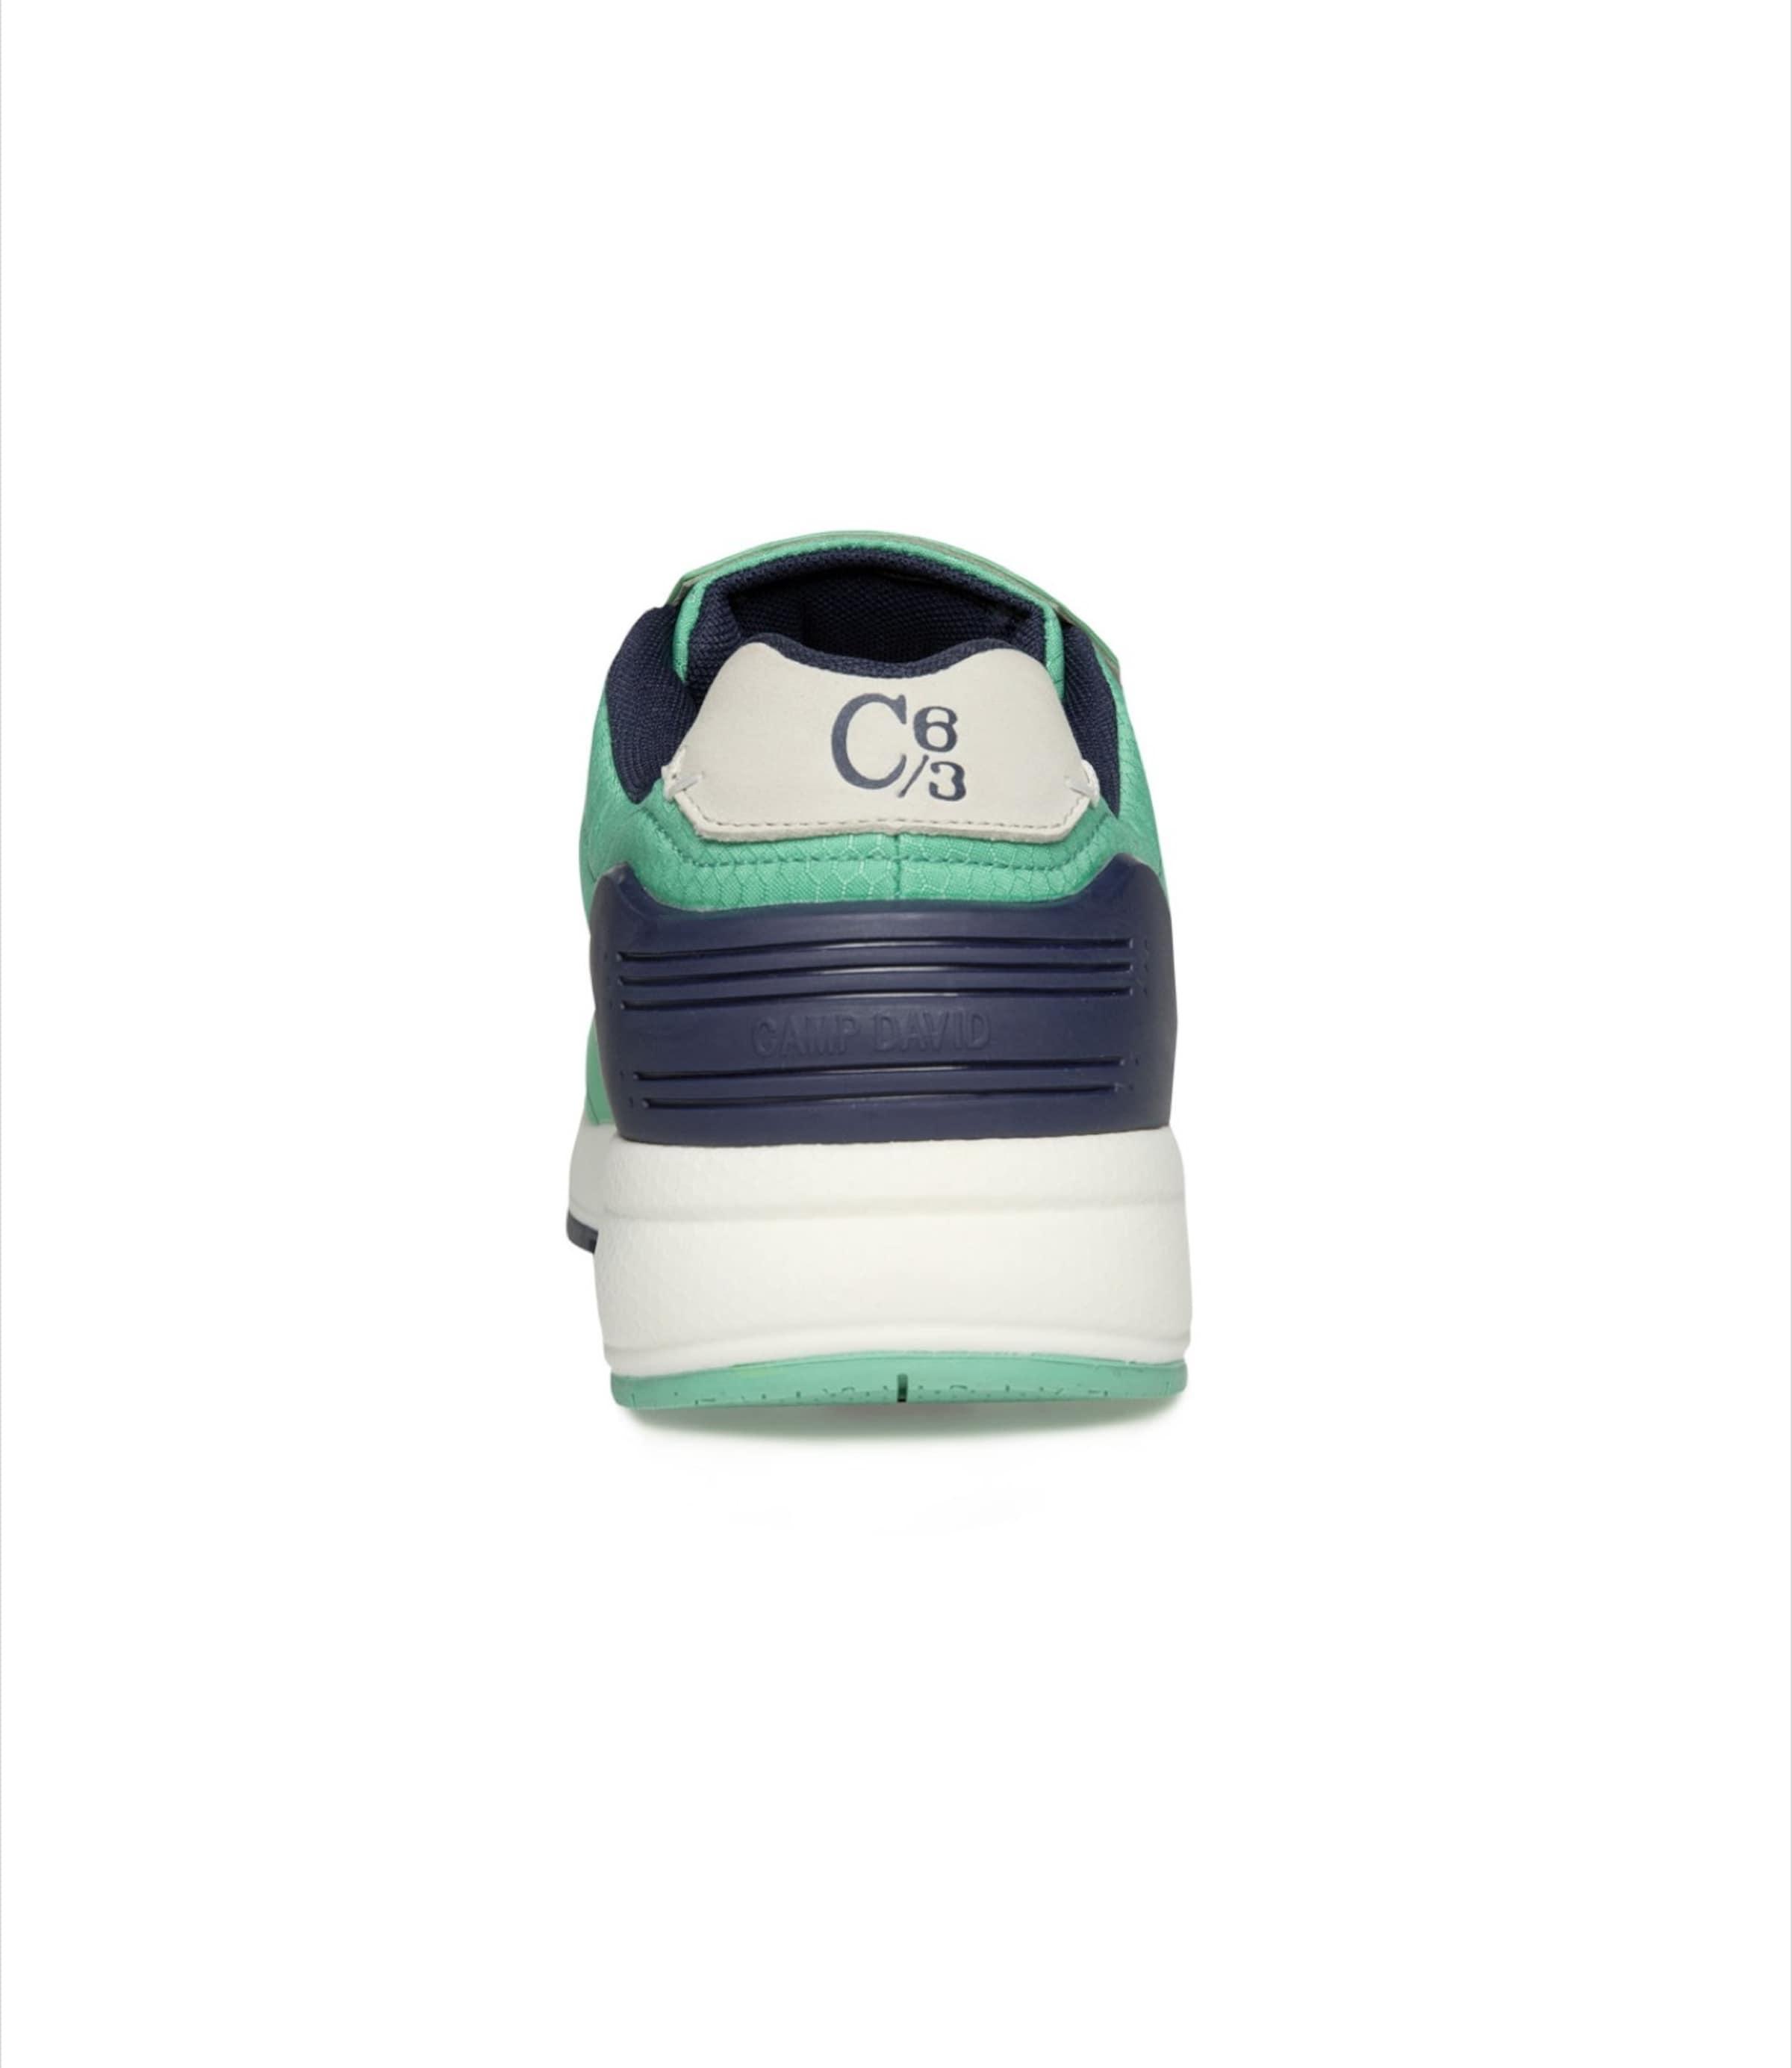 In Sneaker 'power' NavyMint Weiß Camp David vm8nONy0w